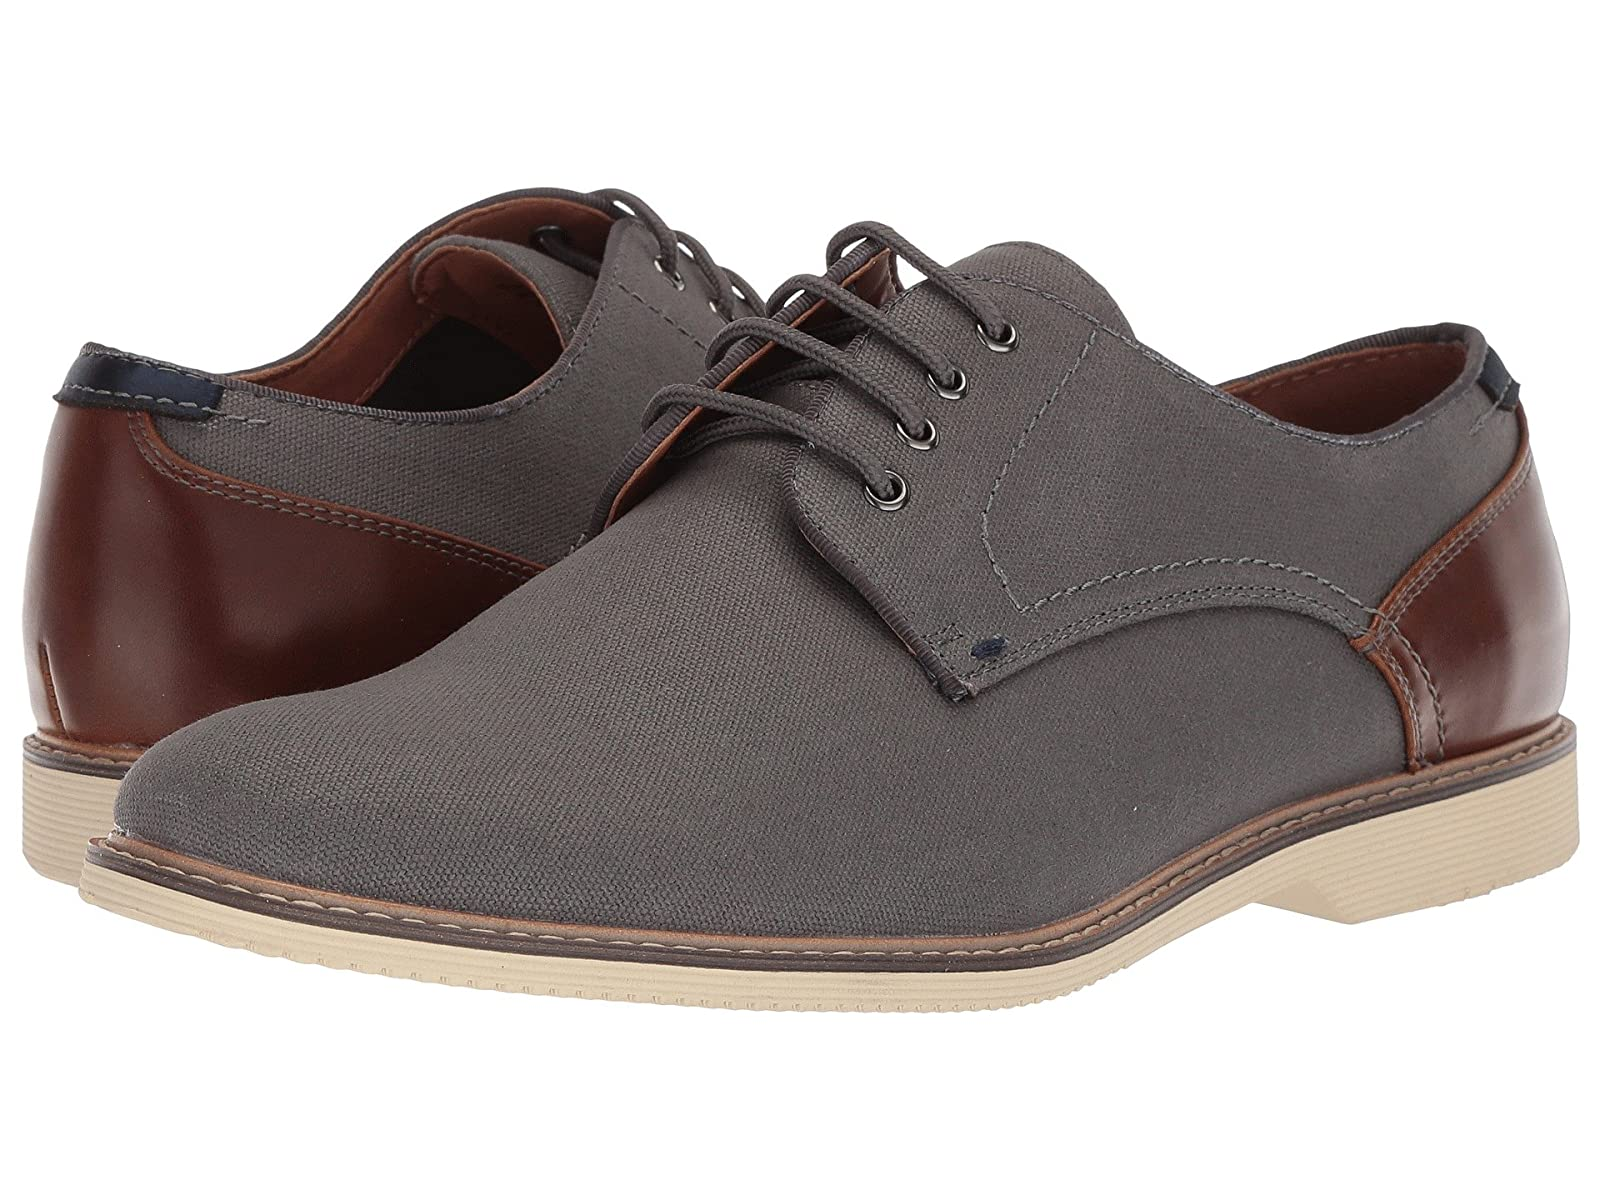 Steve Madden NewsteadAtmospheric grades have affordable shoes